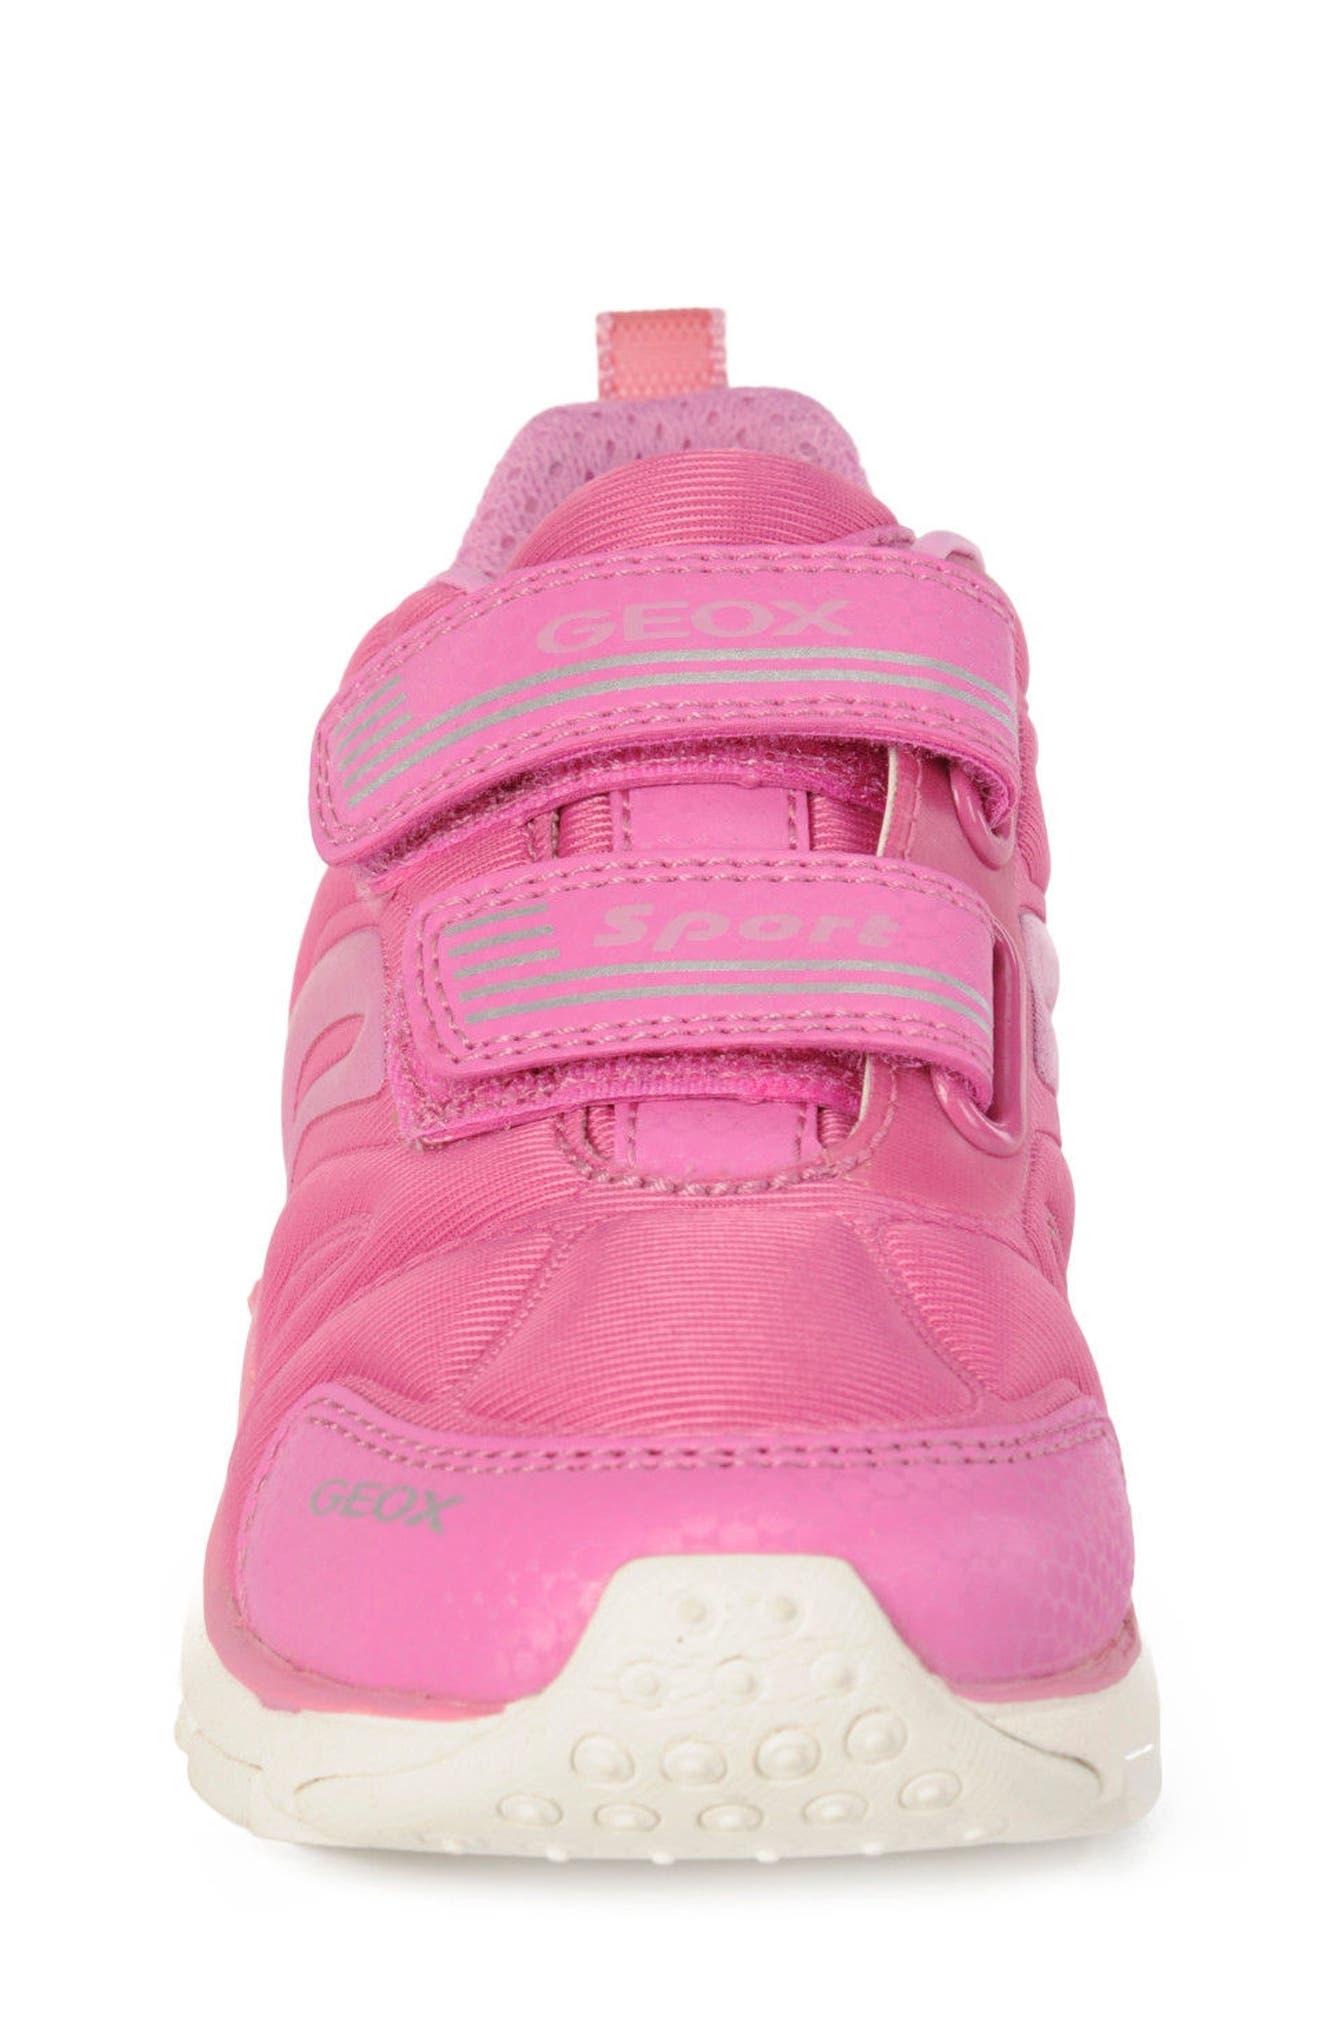 Torque Sneaker,                             Alternate thumbnail 4, color,                             Fuchsia/ Dark Pink